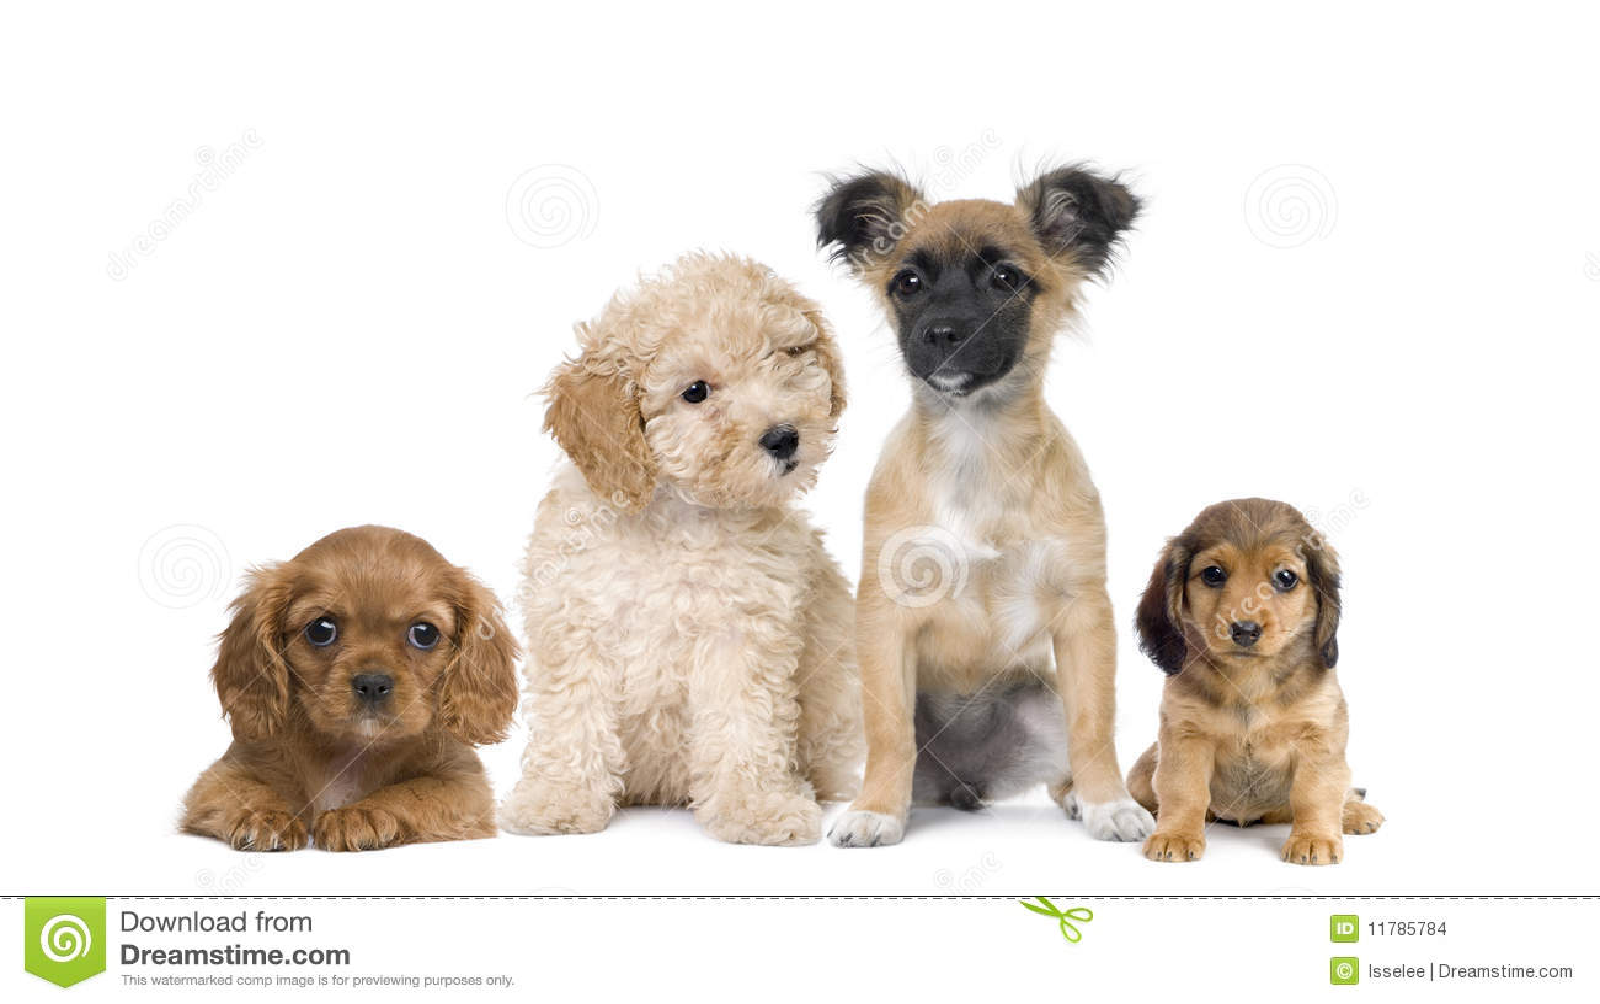 desktop backgrounds puppies and kittens